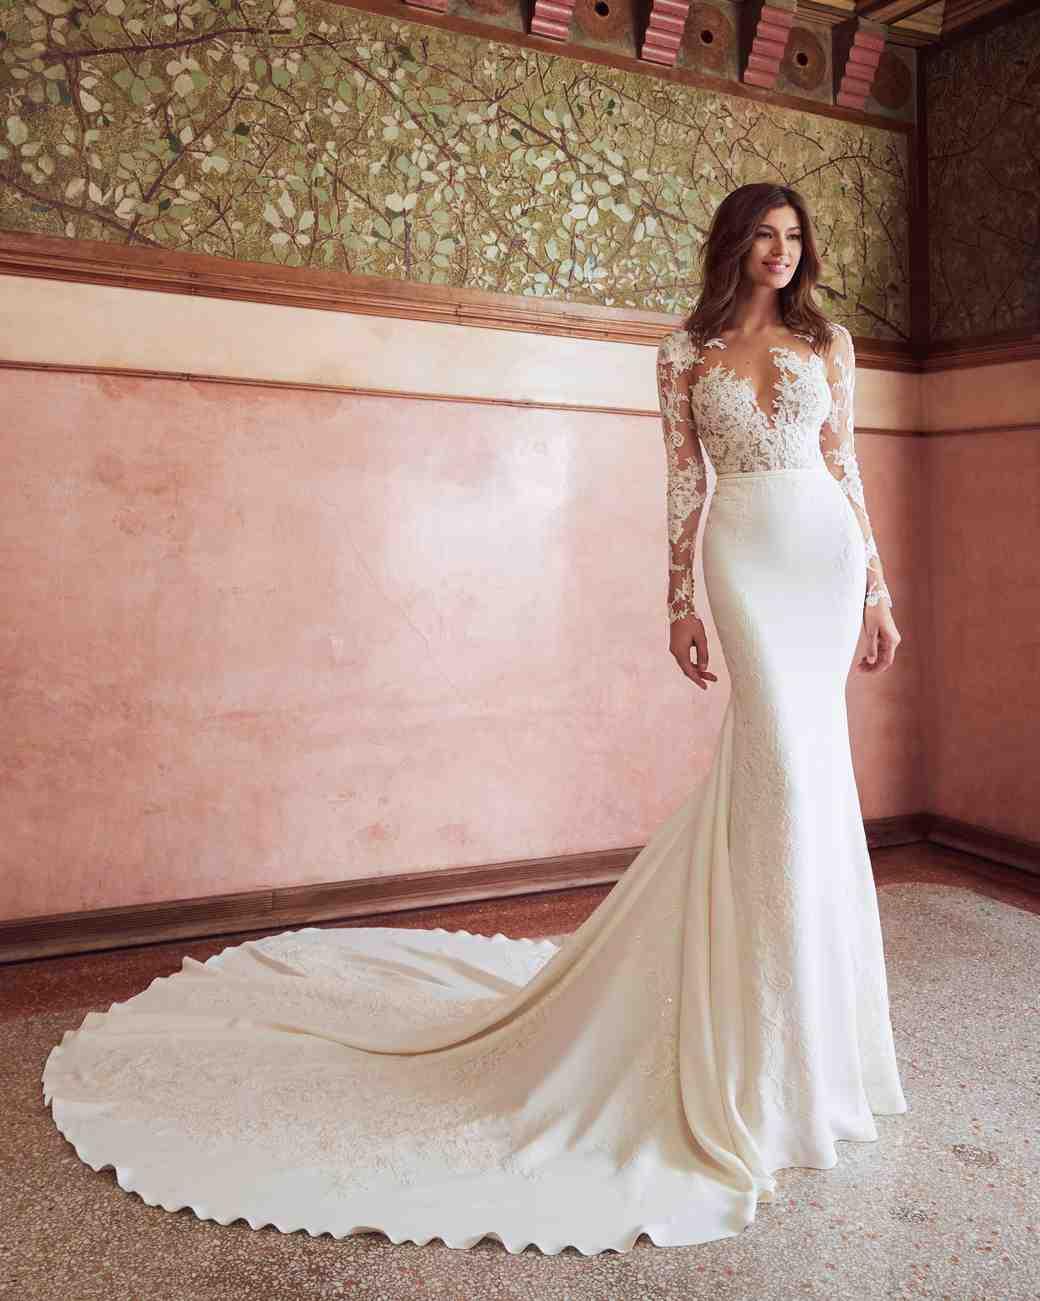 b4c3ad6d38 Pronovias x Kleinfeld Fall 2019 Wedding Dress Collection